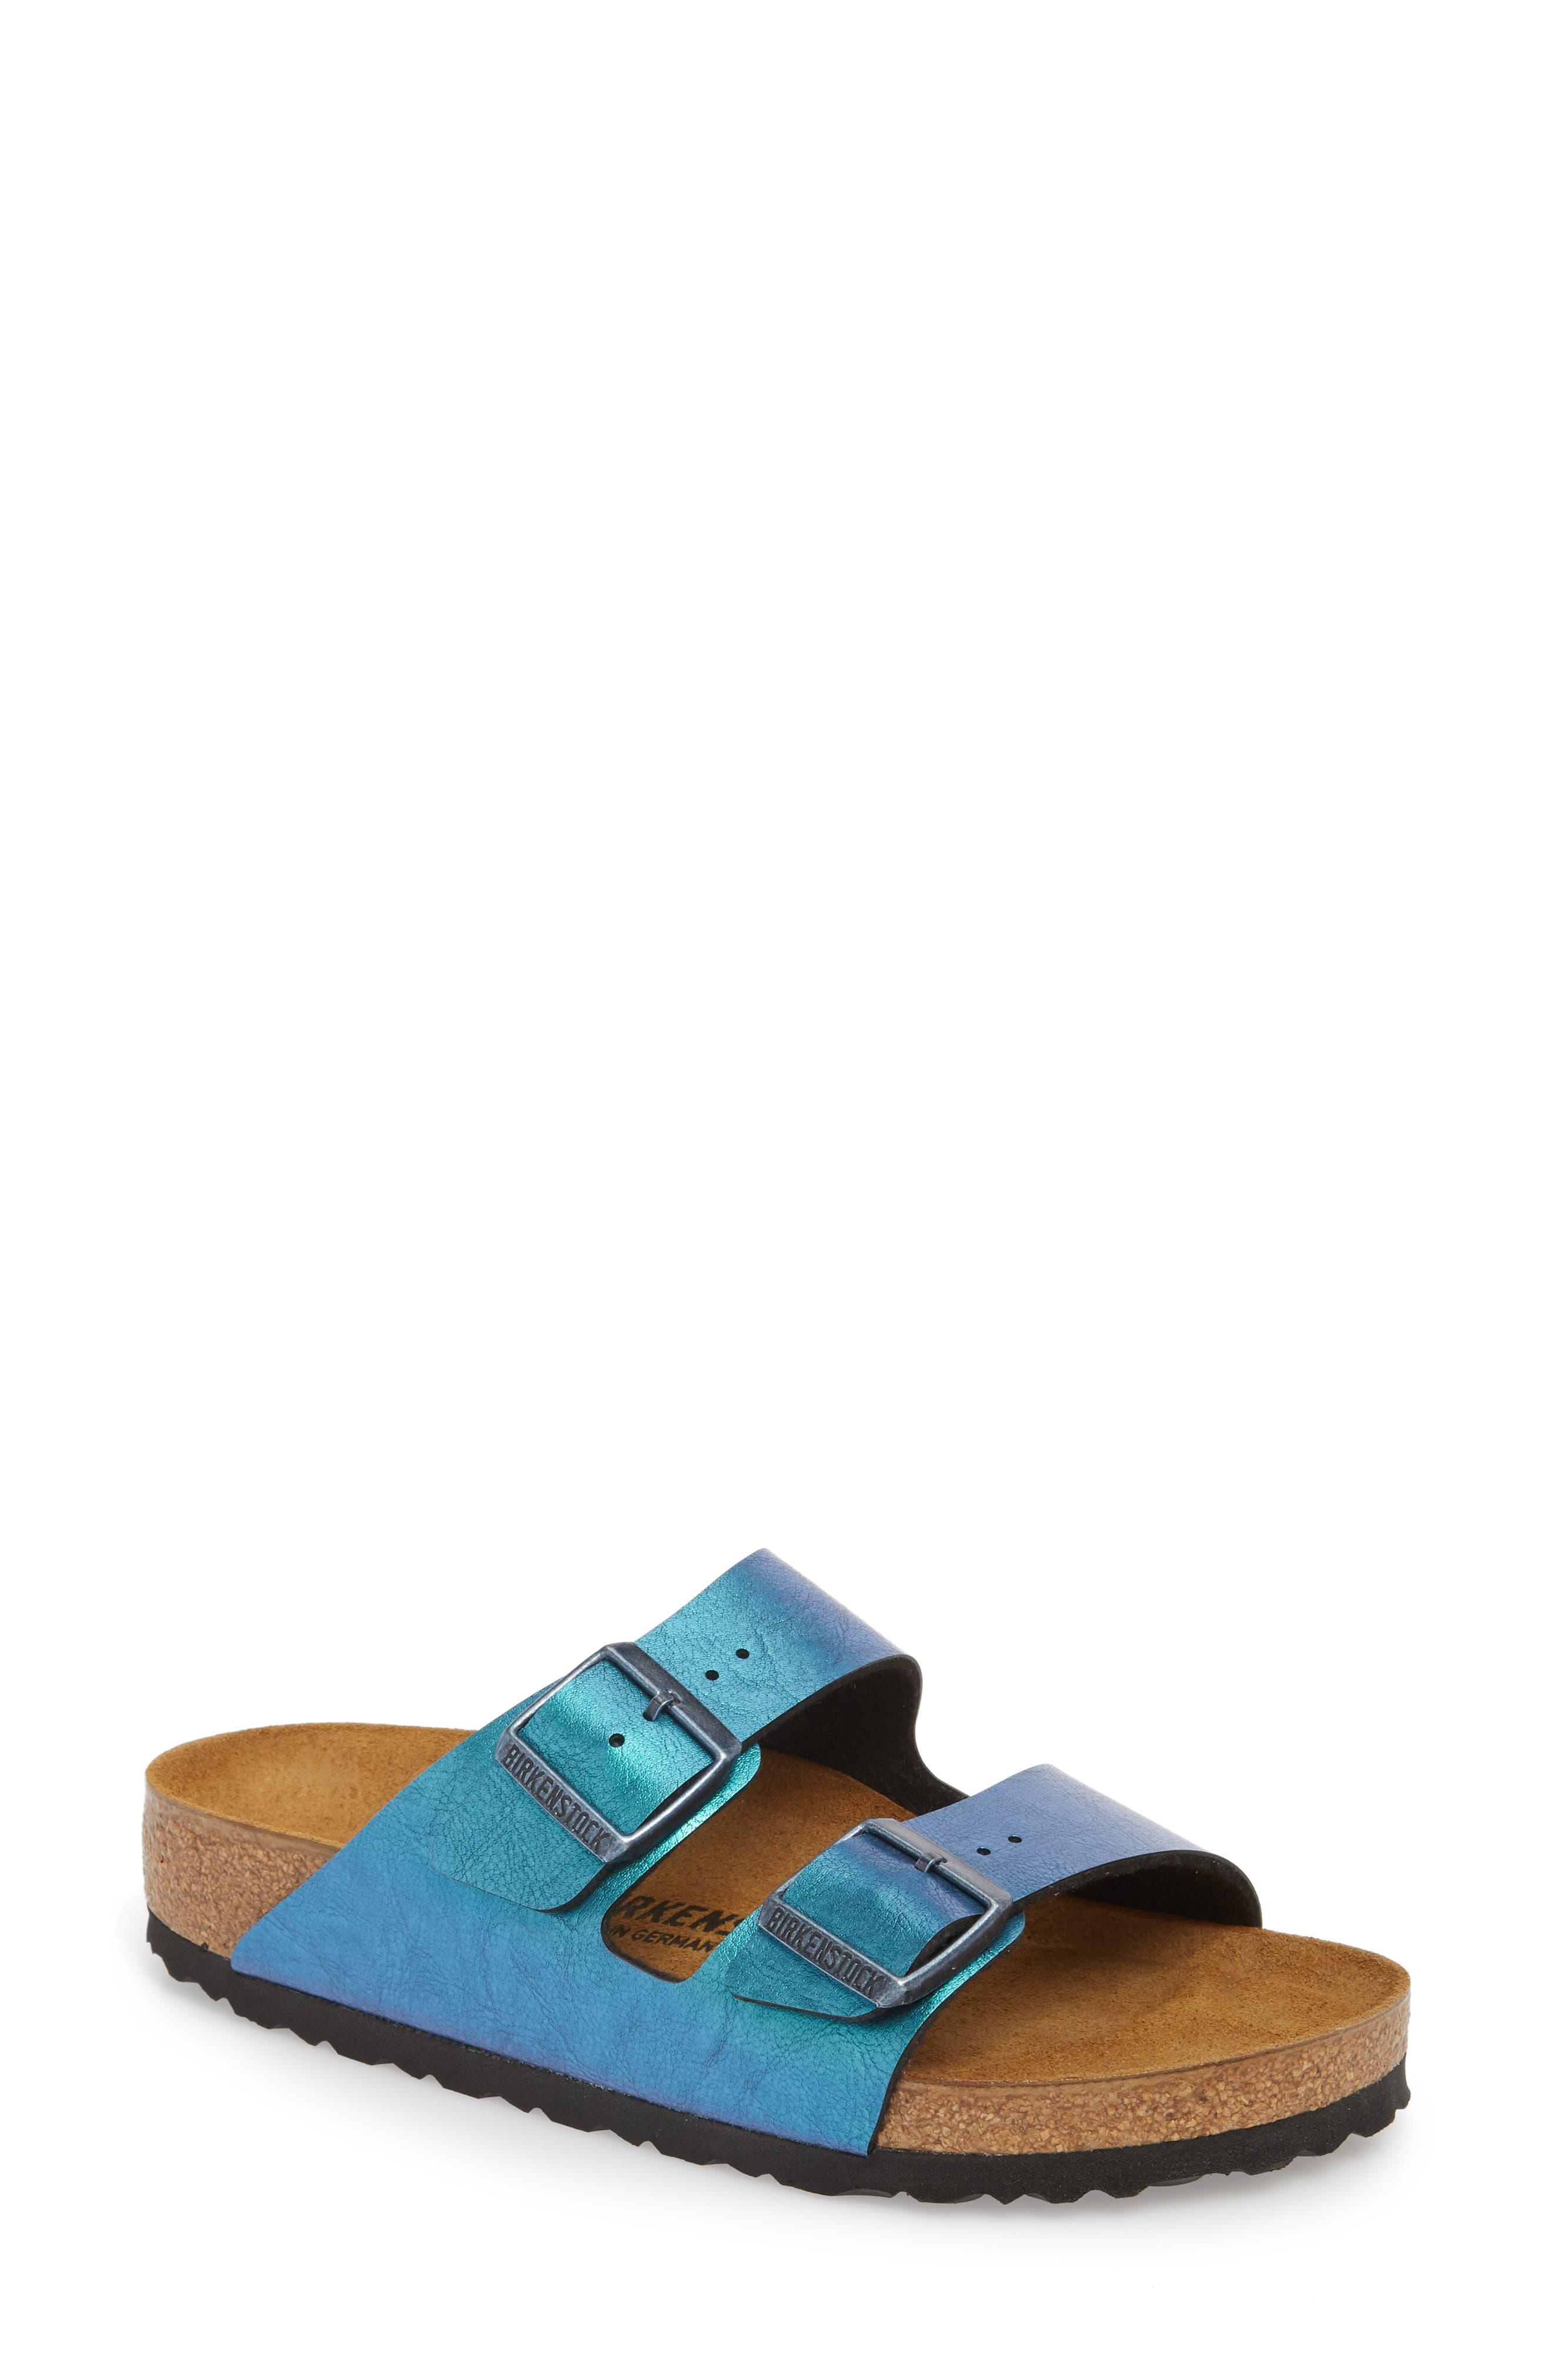 Arizona Graceful Birko-Flor<sup>™</sup> Sandal,                             Main thumbnail 1, color,                             Blue